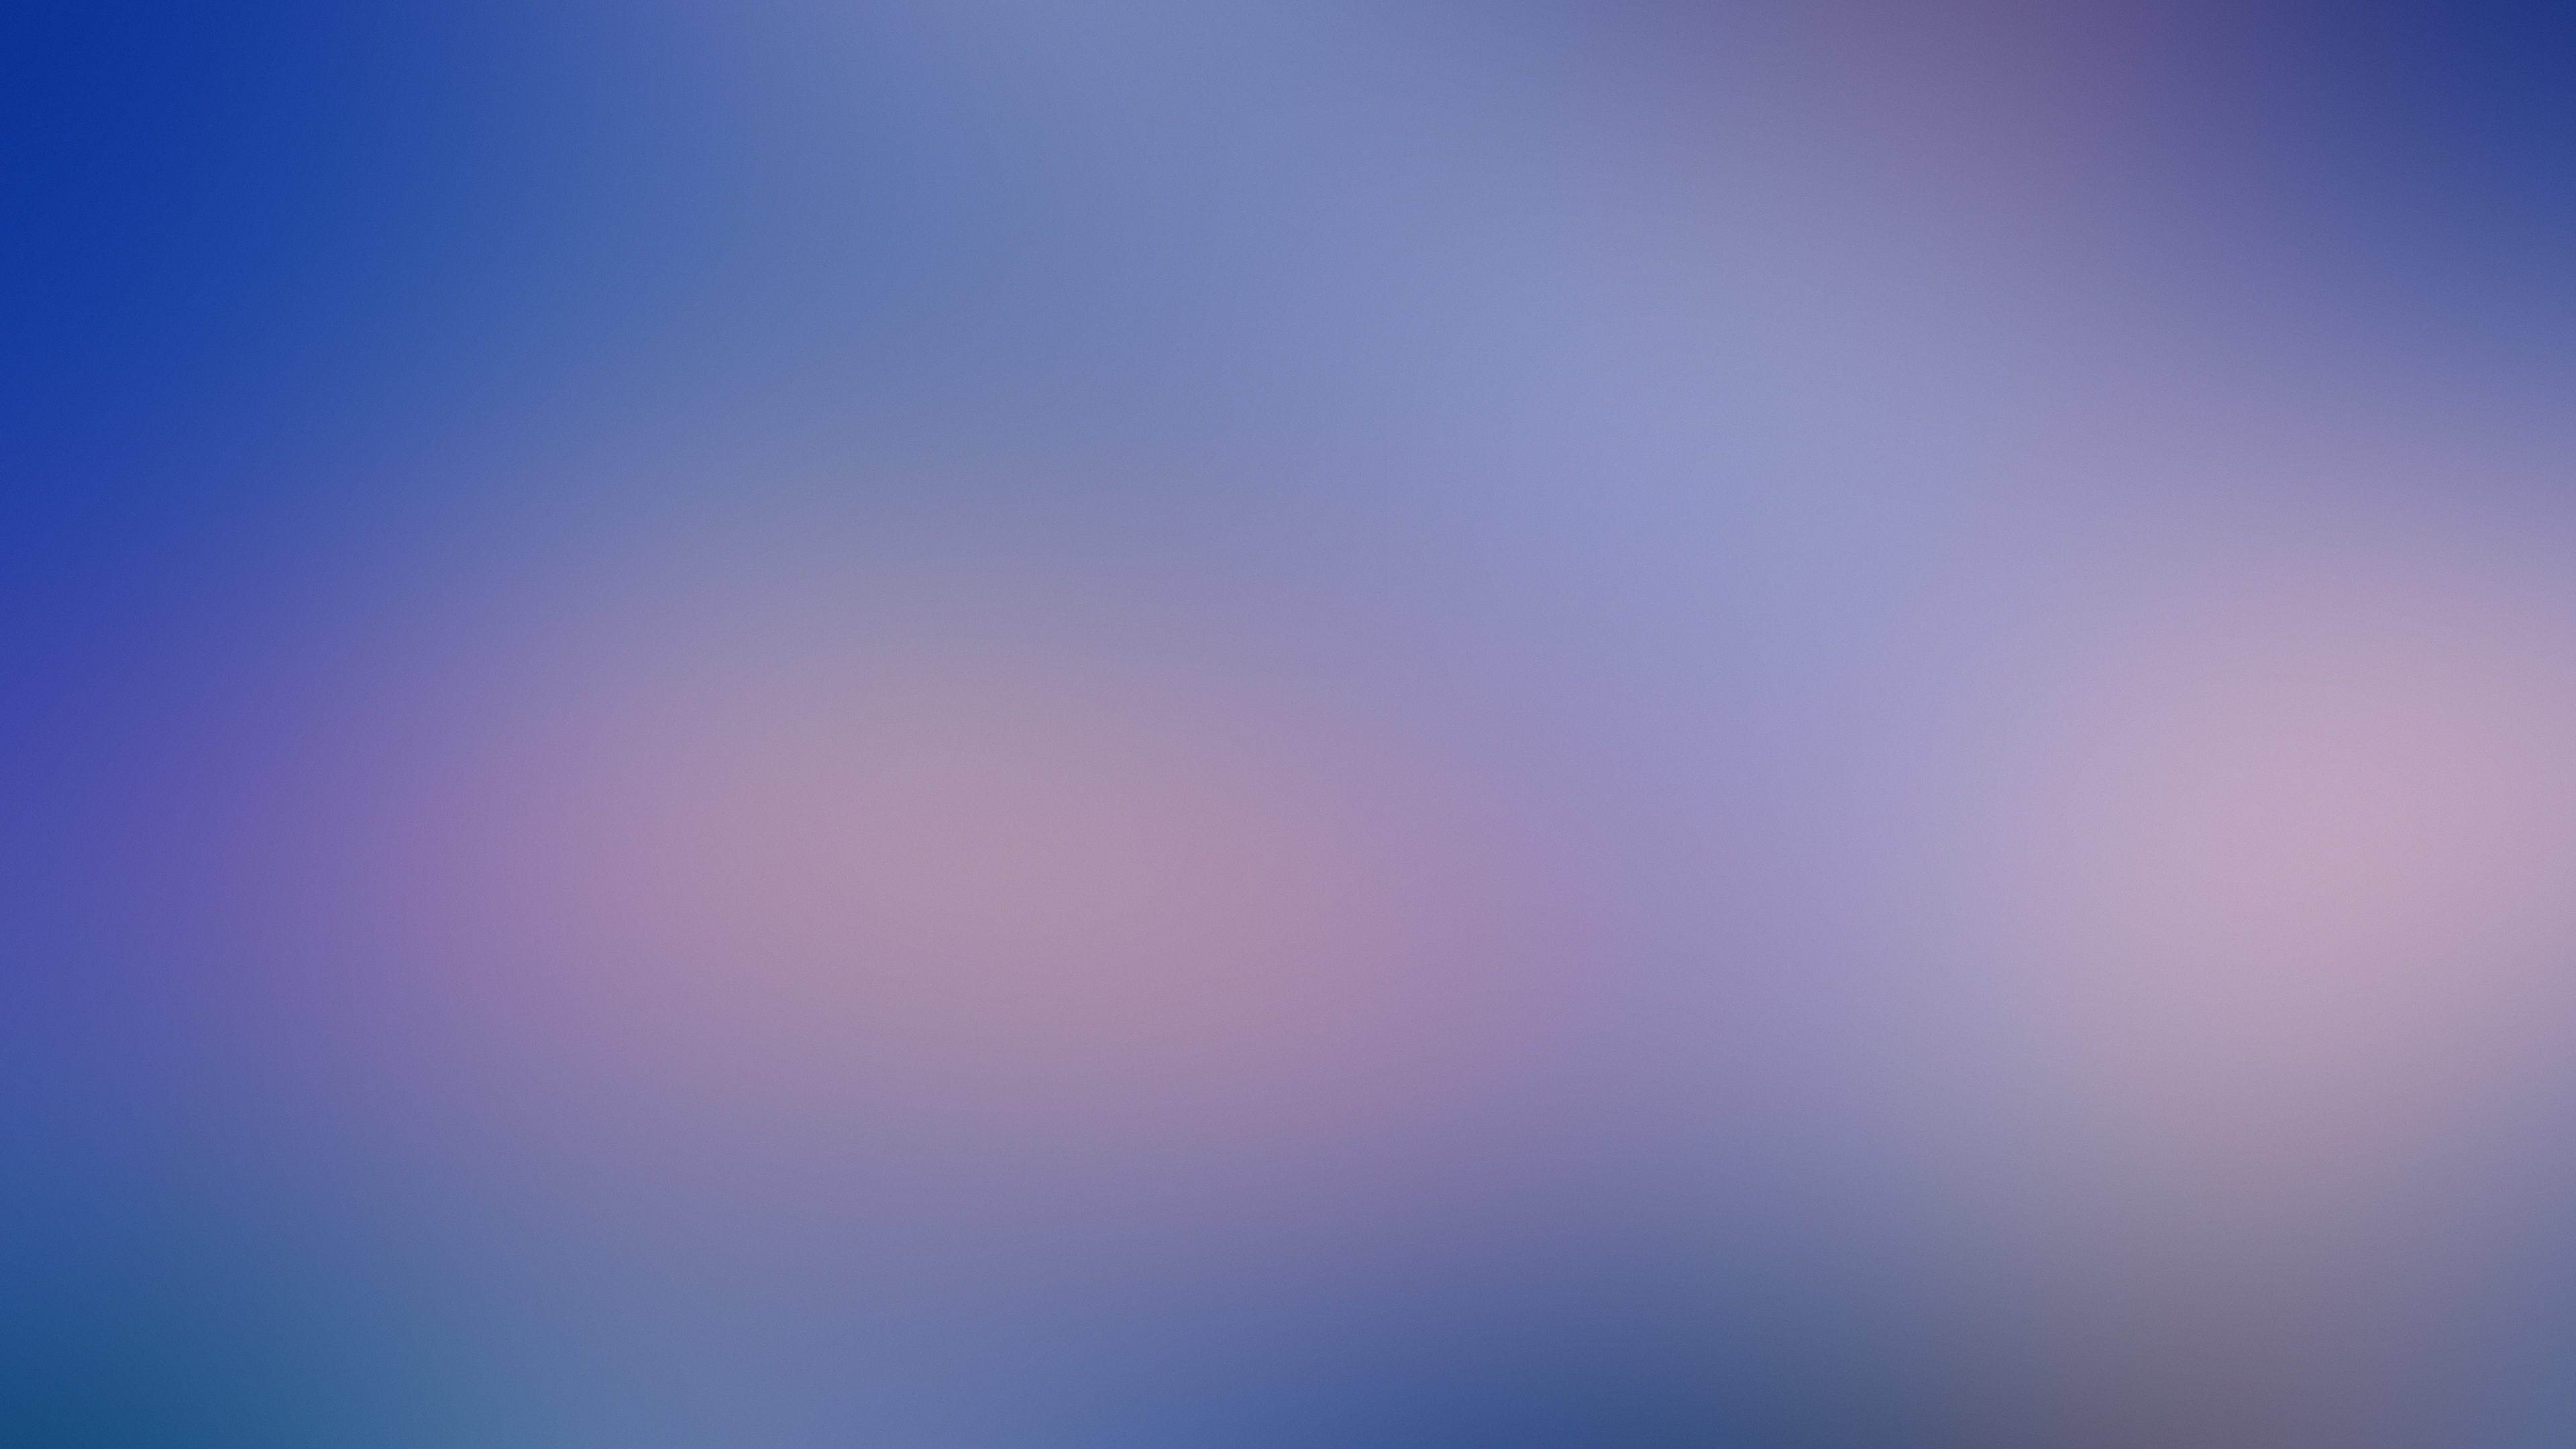 peaceful blur background 4k 1555207903 - Peaceful Blur Background 4k - hd-wallpapers, deviantart wallpapers, blur wallpapers, abstract wallpapers, 5k wallpapers, 4k-wallpapers